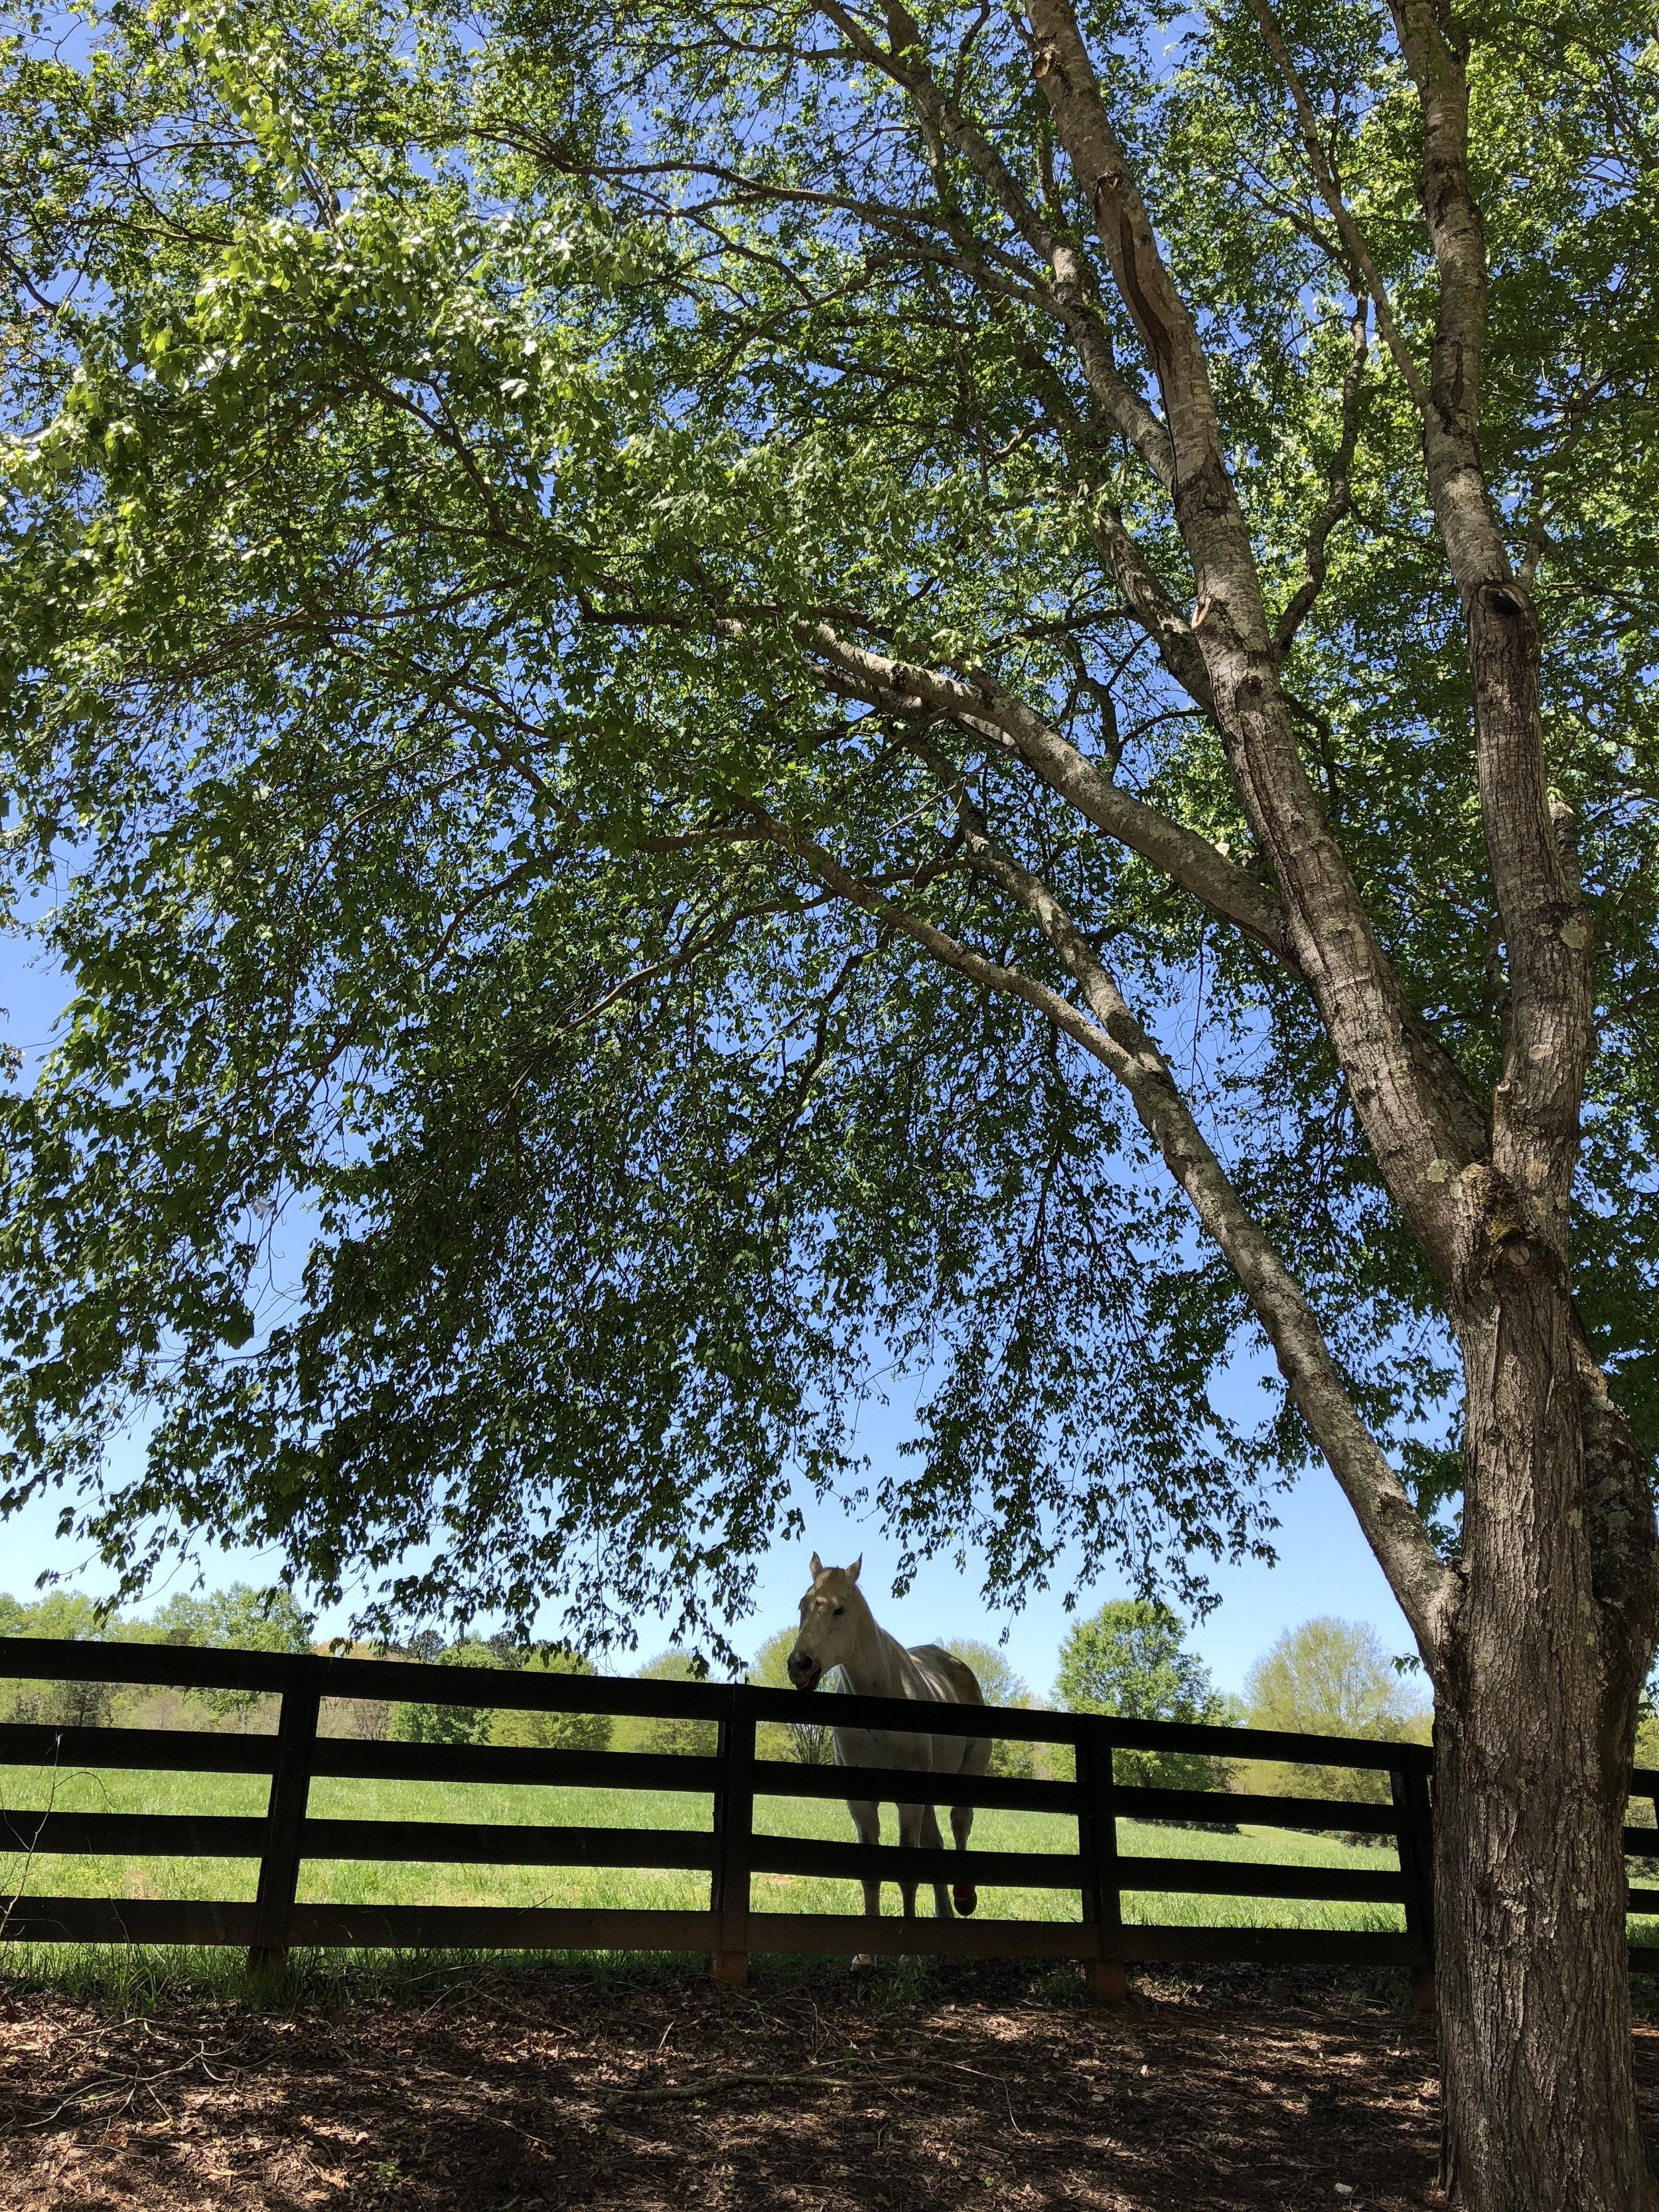 white-horse-fence-tree-sky.jpg